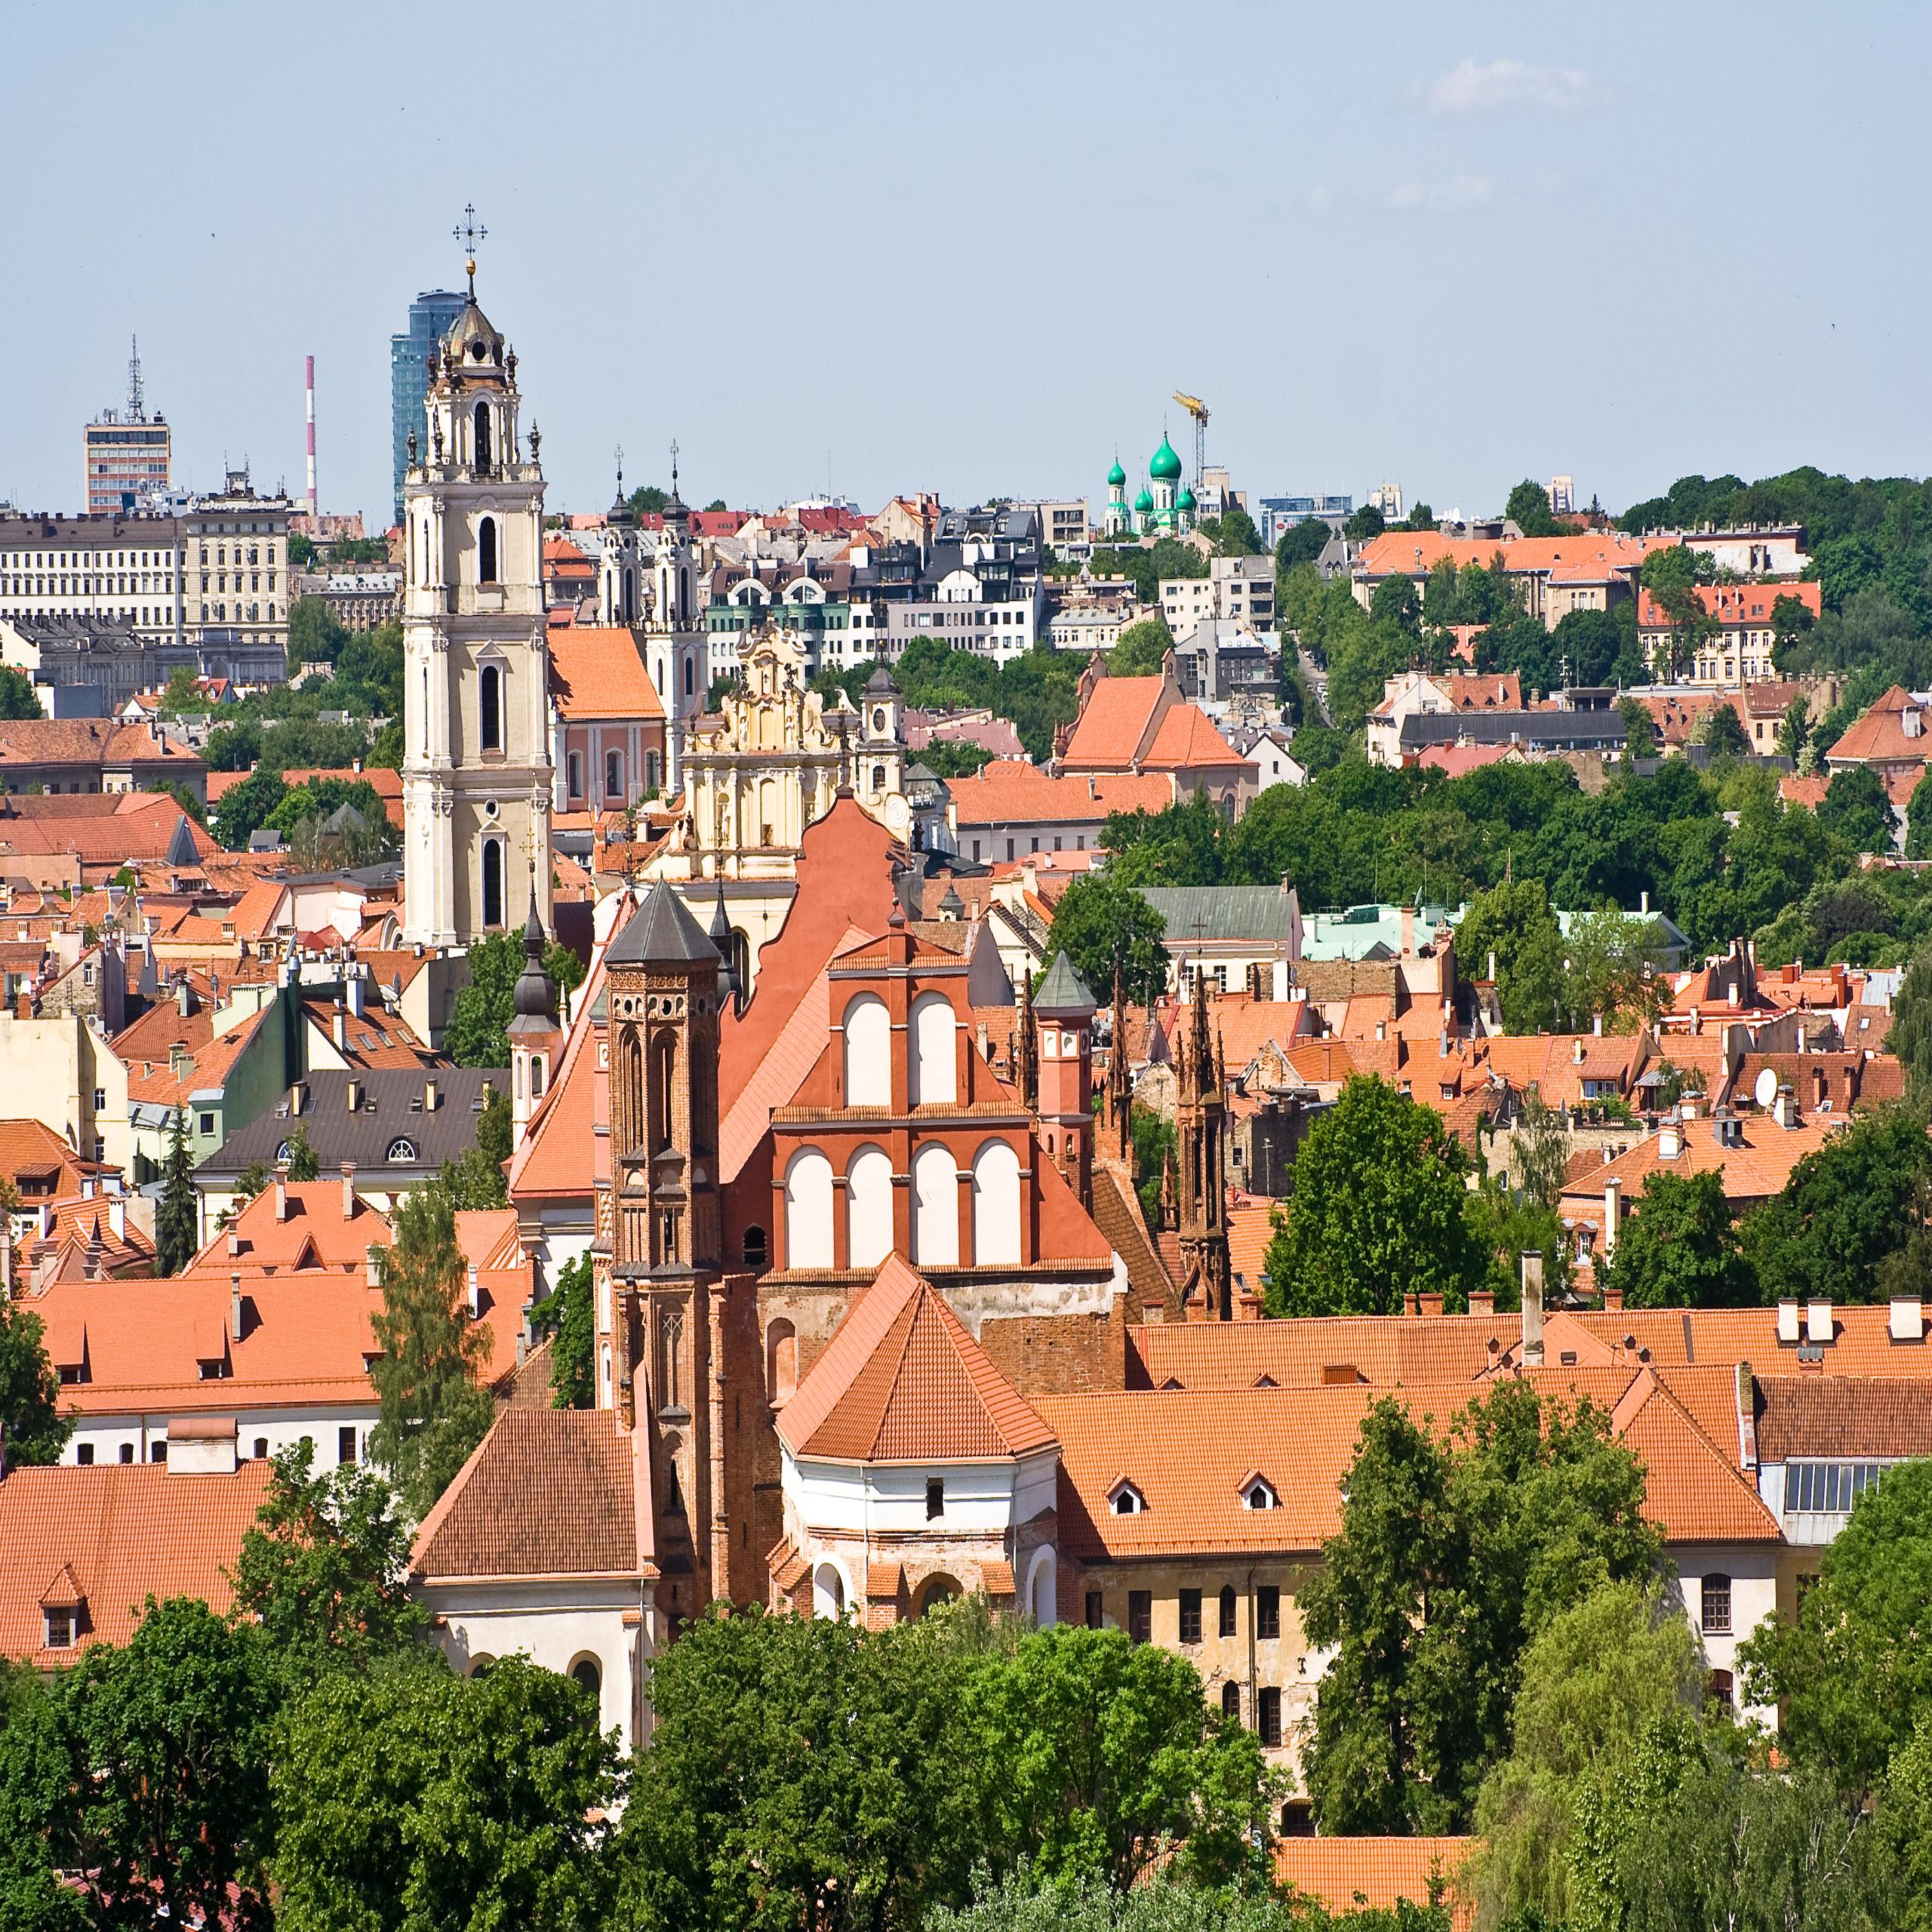 vilnius - centro storico